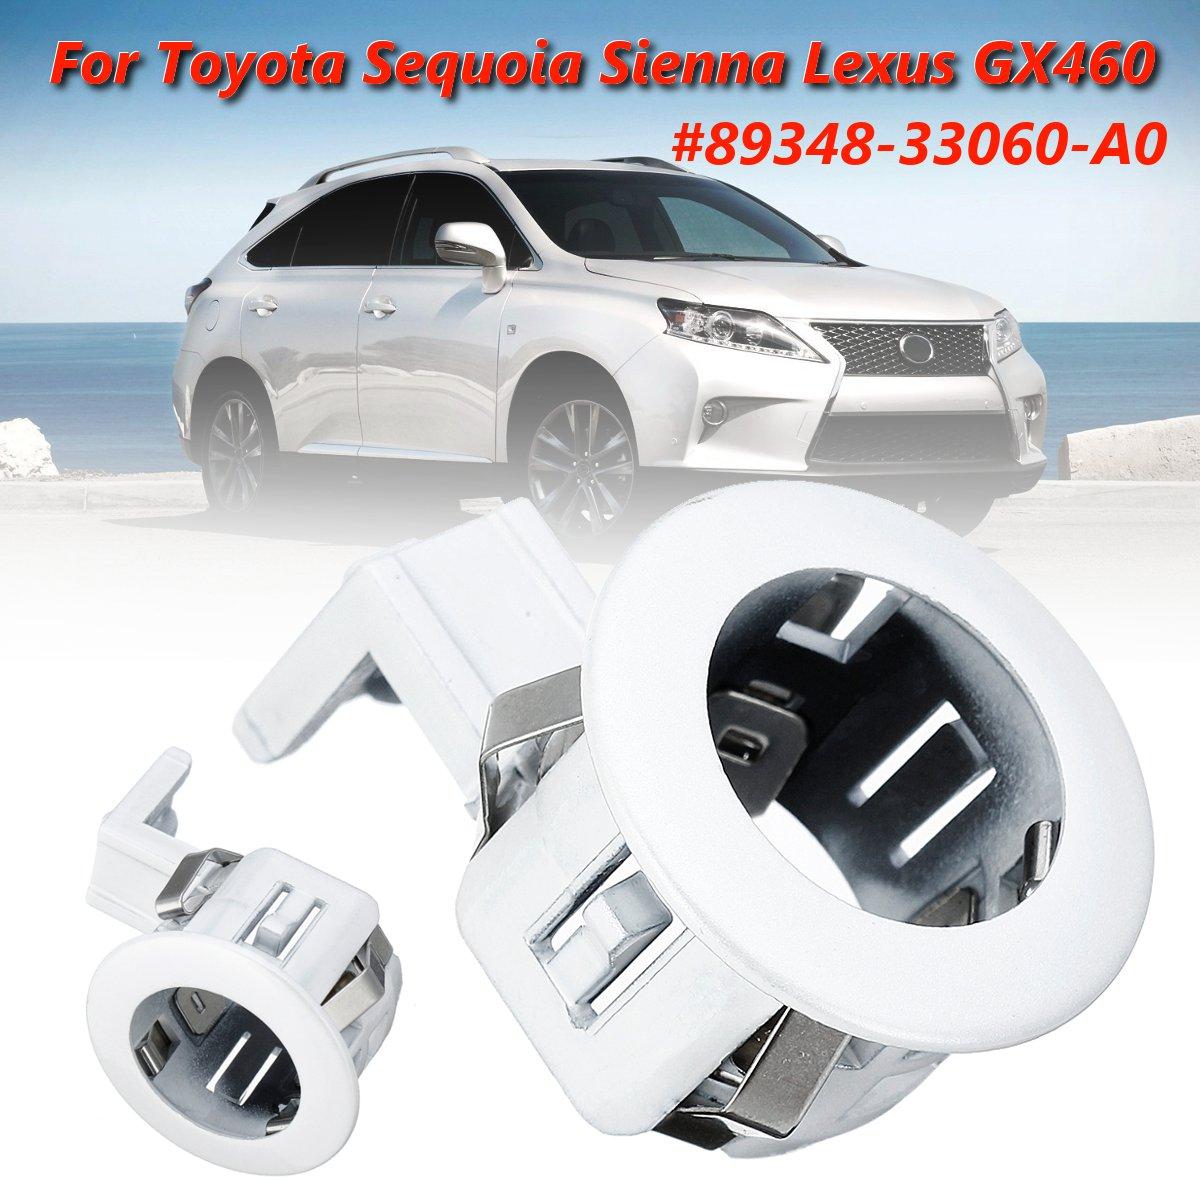 8934833060 89348-33060-A0 Sensor de estacionamiento PDC para Toyota Sequoia Sienna para Lexus GX460